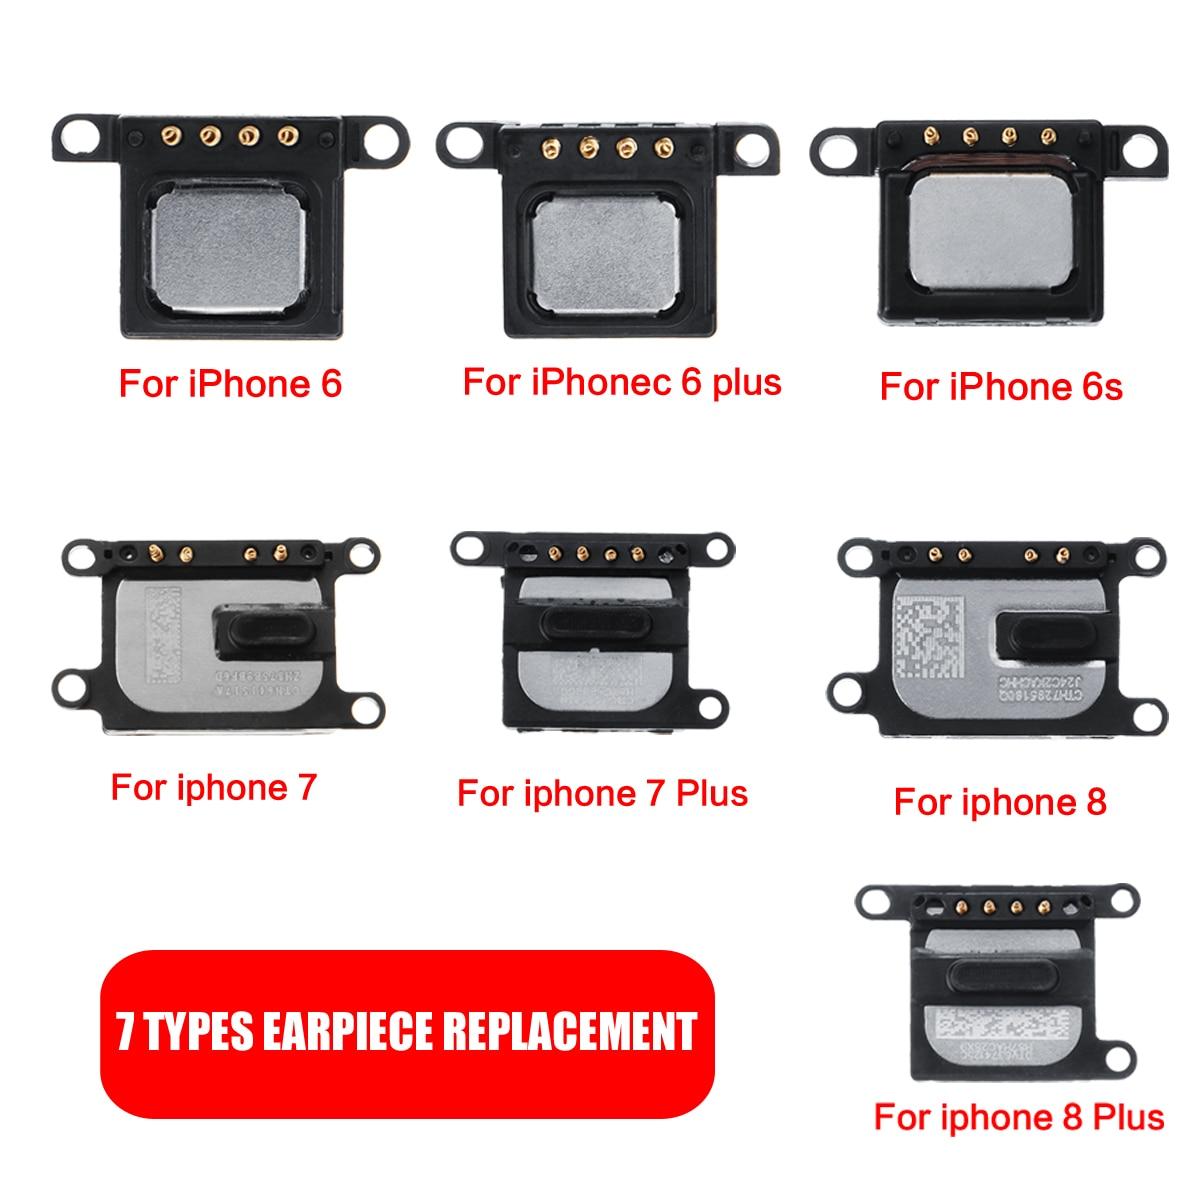 7 Types Earpiece Speaker Replacement for iPhone 6 6plus 6s 7 7plus 8 8plus Ear Speaker Repair